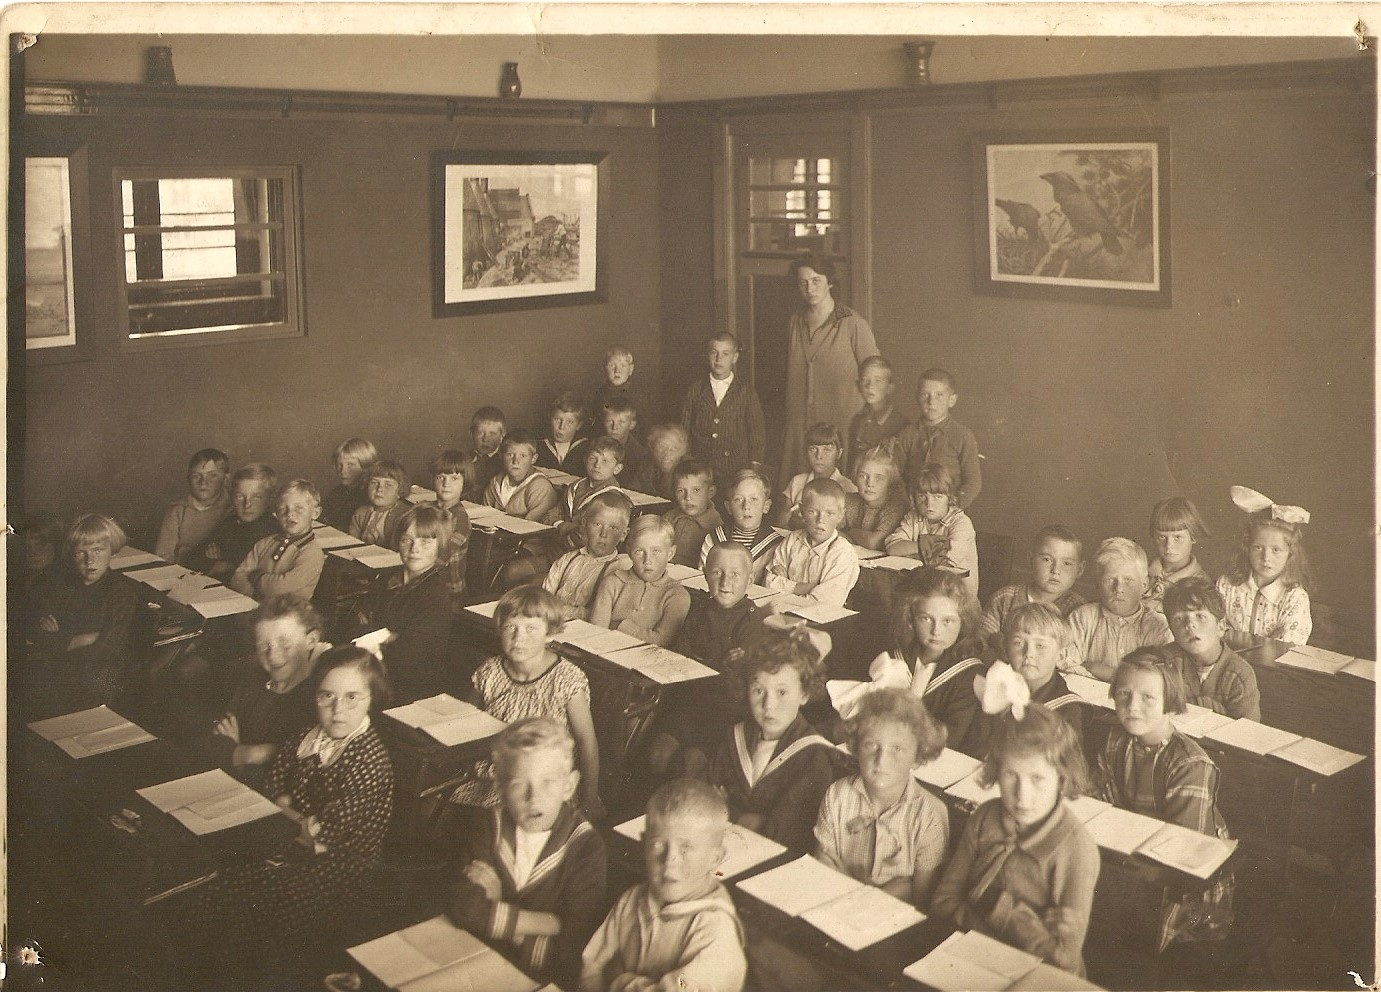 Wilhelminaschool / Oranje Nassauschool foto